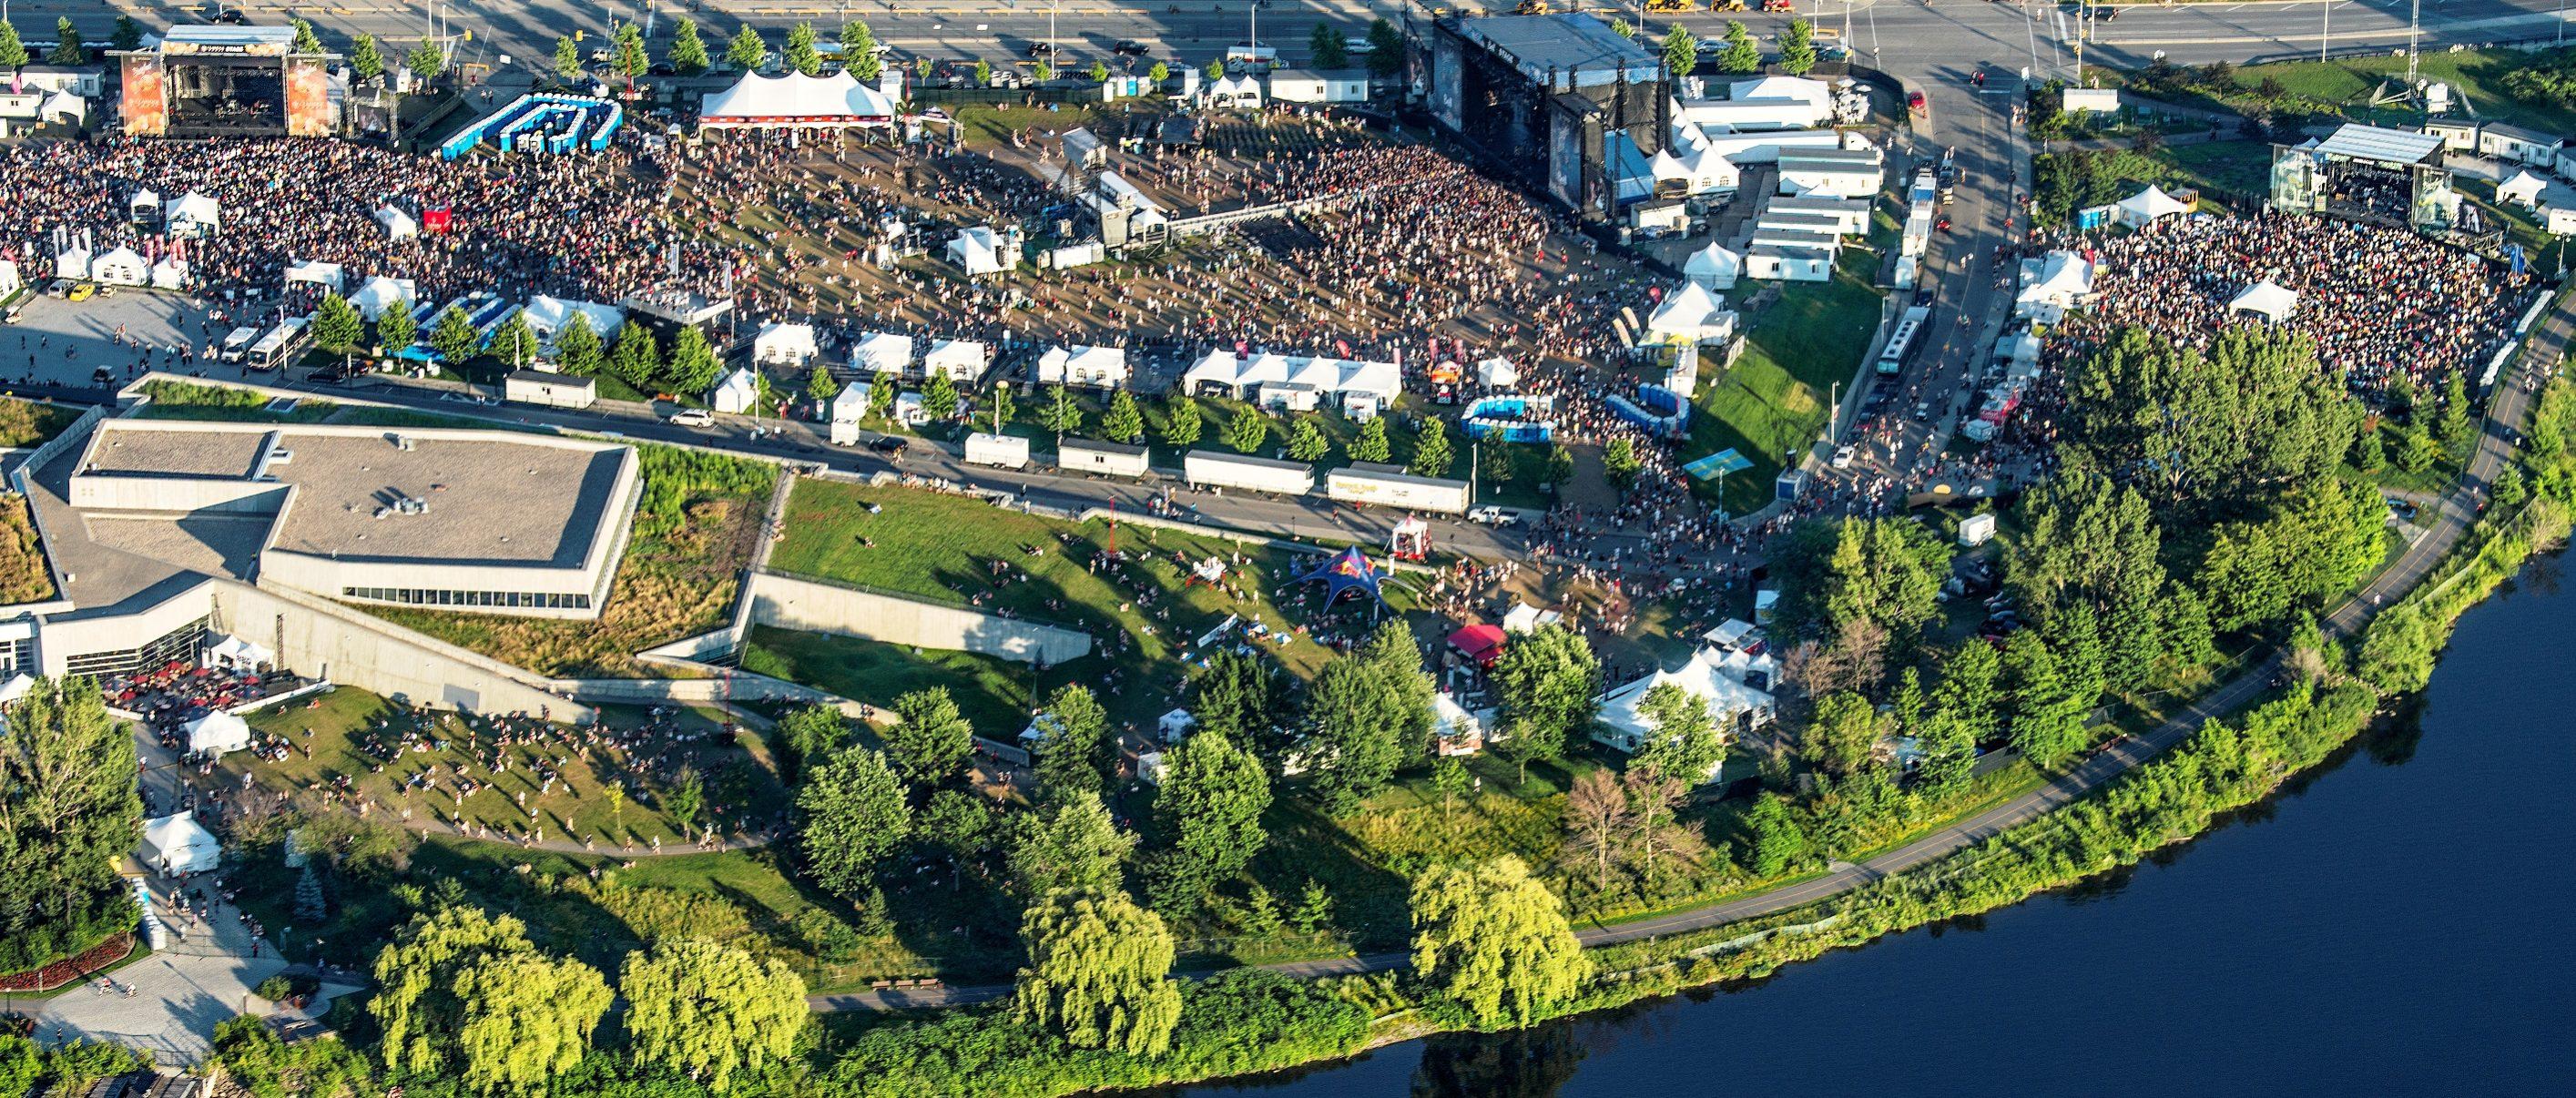 Bluesfest aerial view